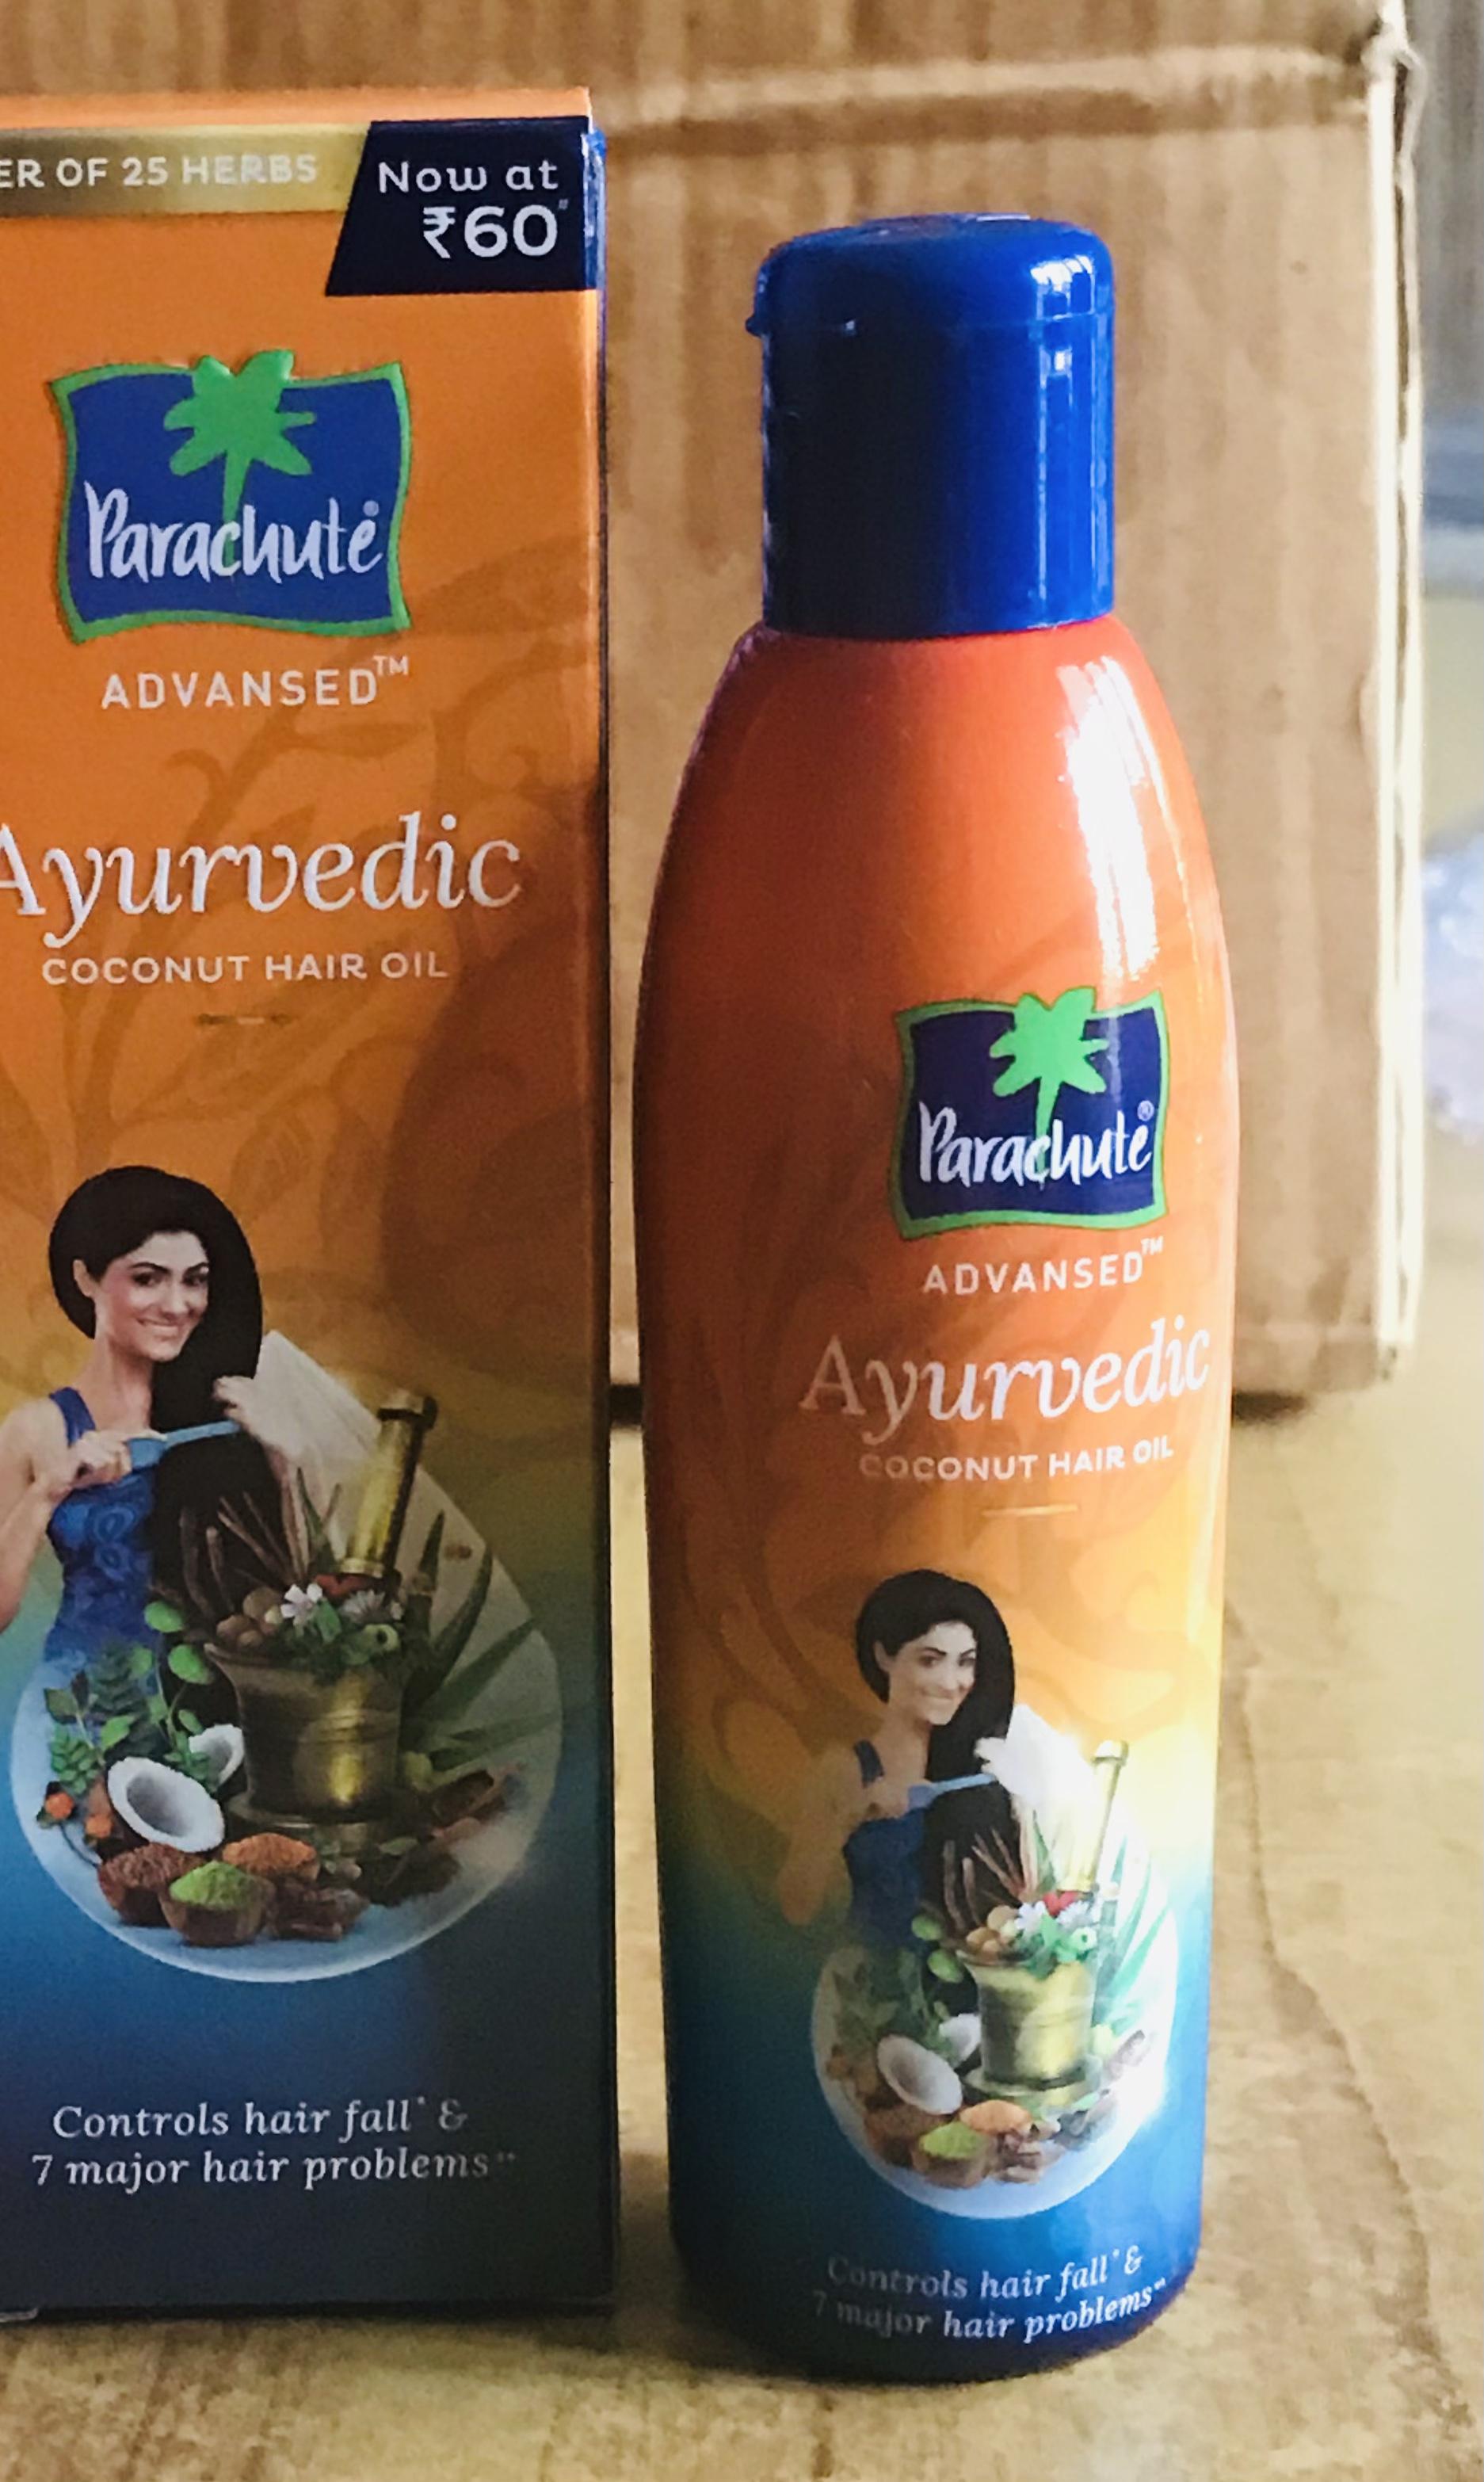 Parachute Advansed Ayurvedic Coconut Hair Oil-Most effective hair oil on dandruff-By sarita_choudhary